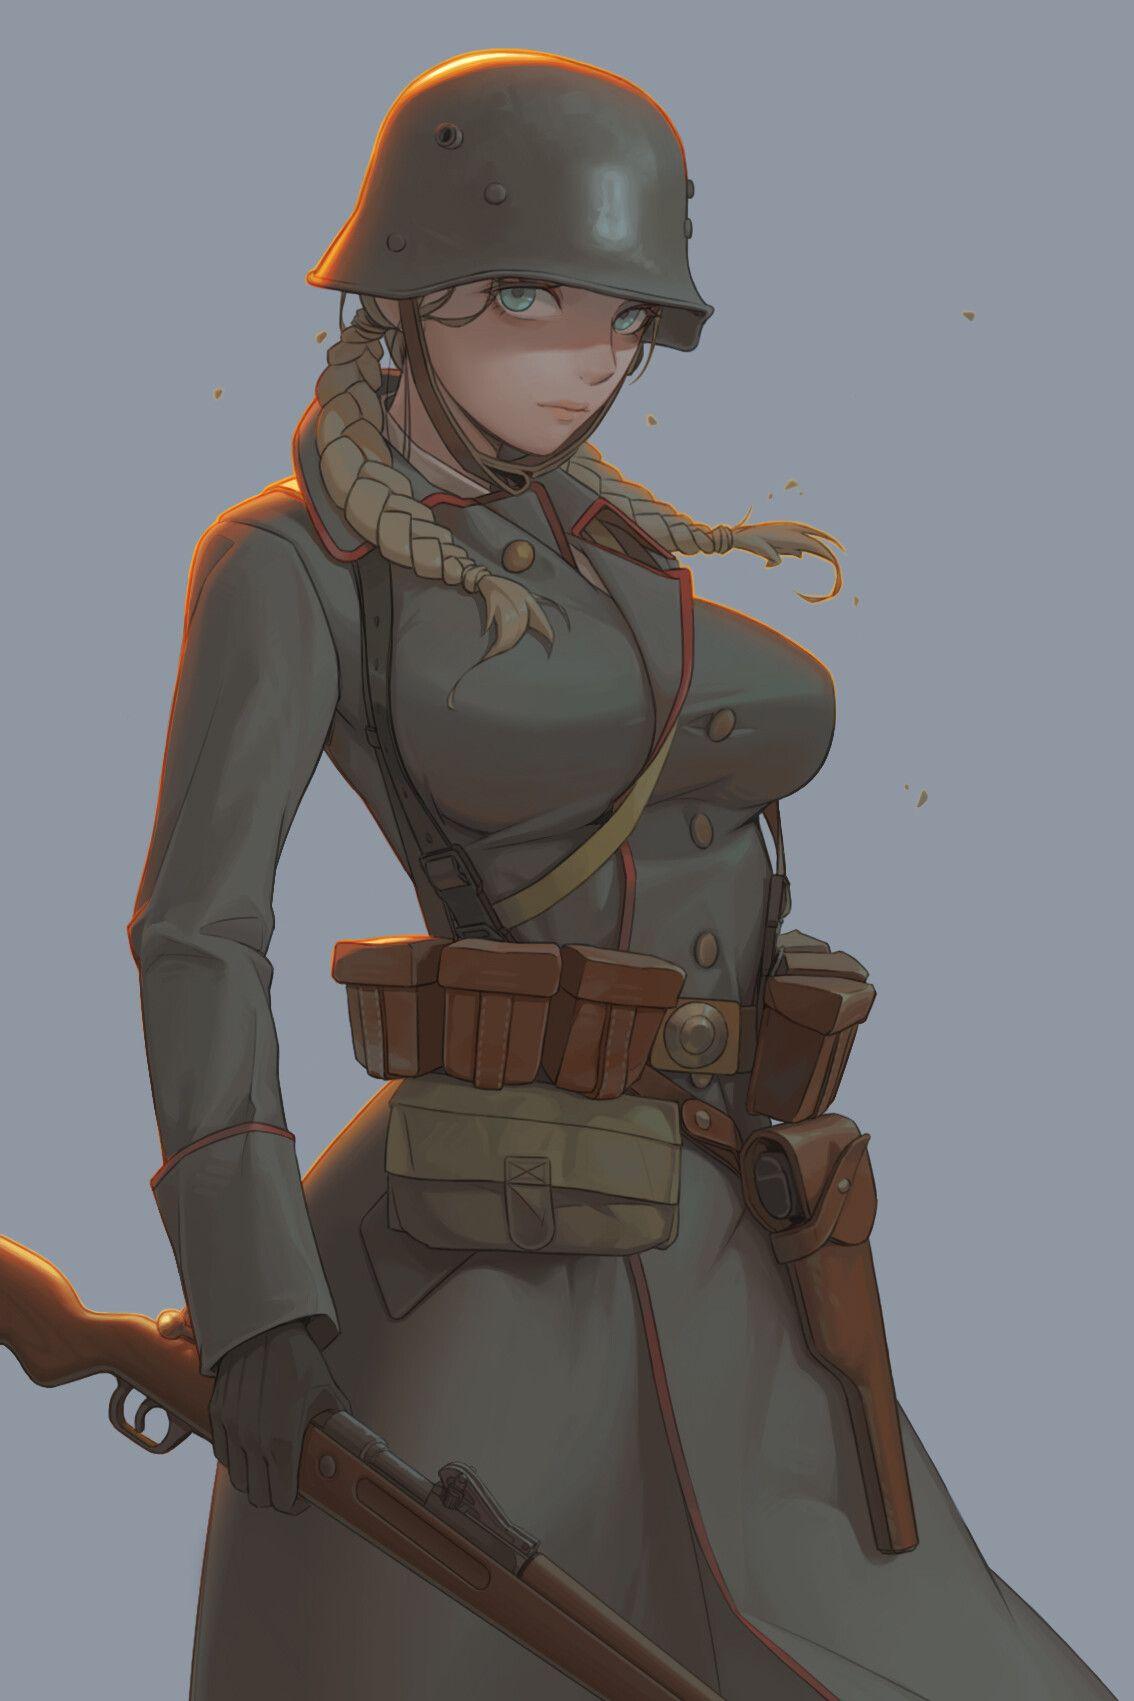 ArtStation 战地1同盟国德意志帝国侦察兵, BK 201 Anime military